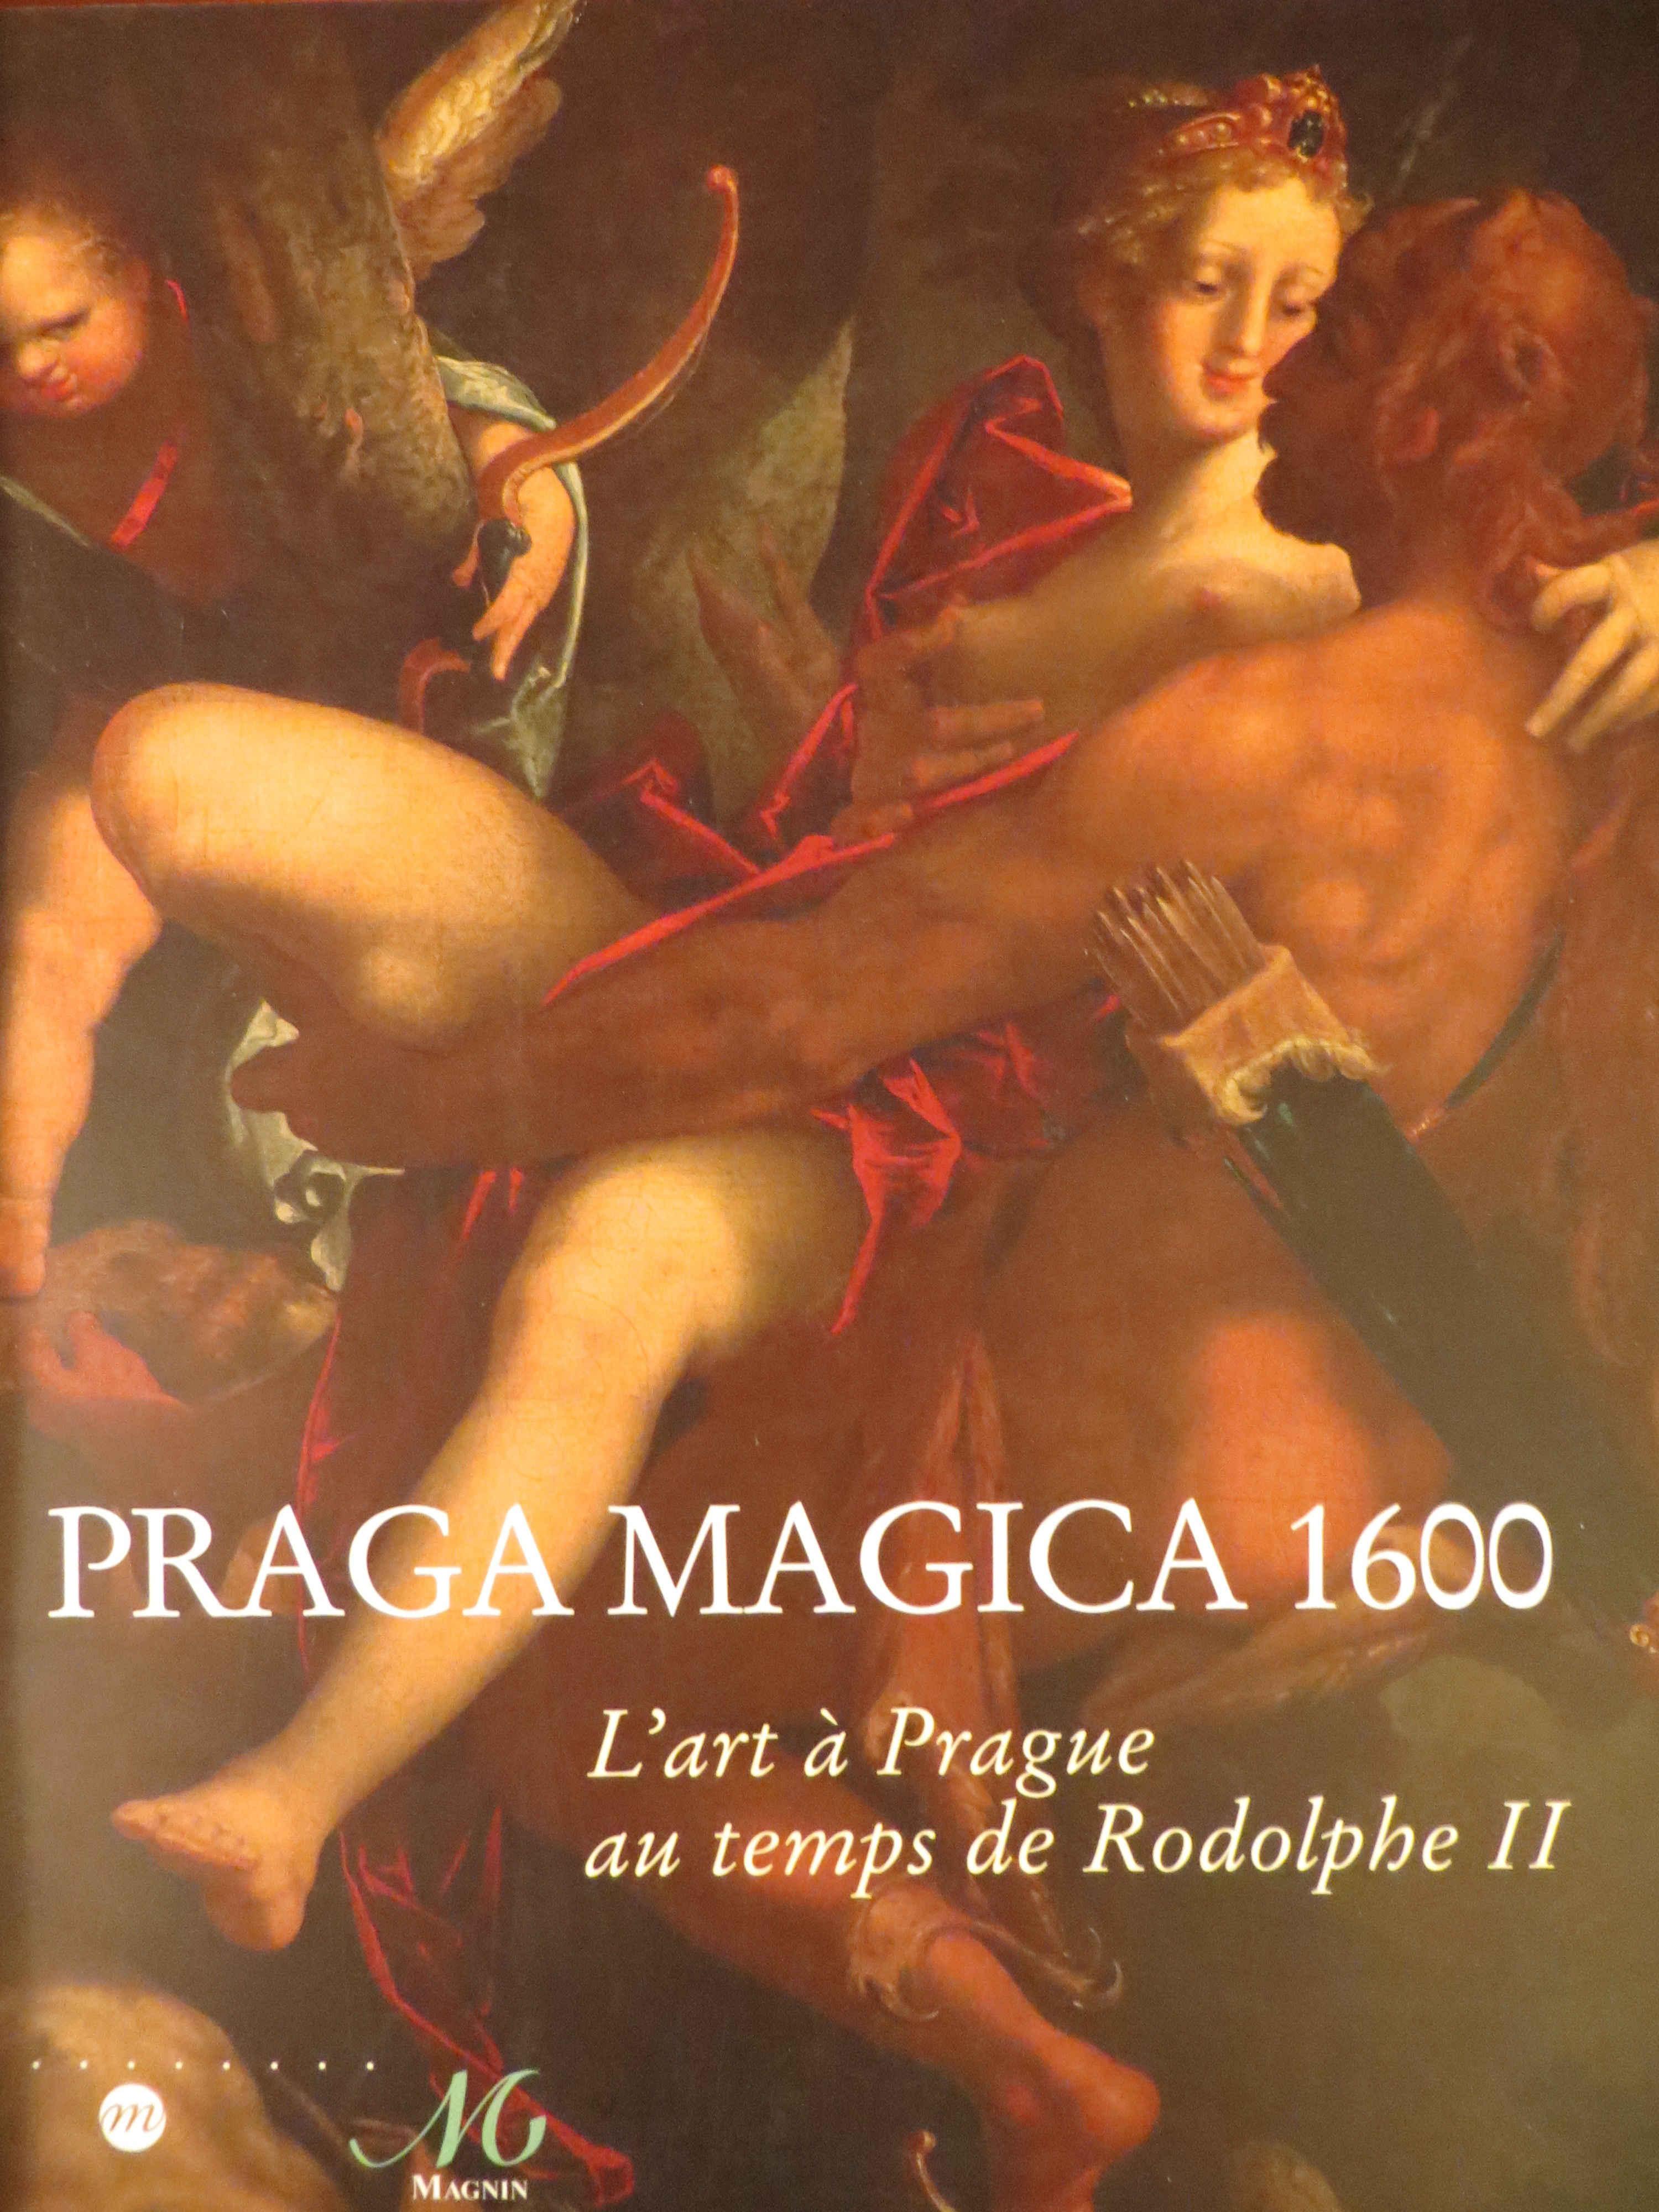 Praga Magica - musée Magnin